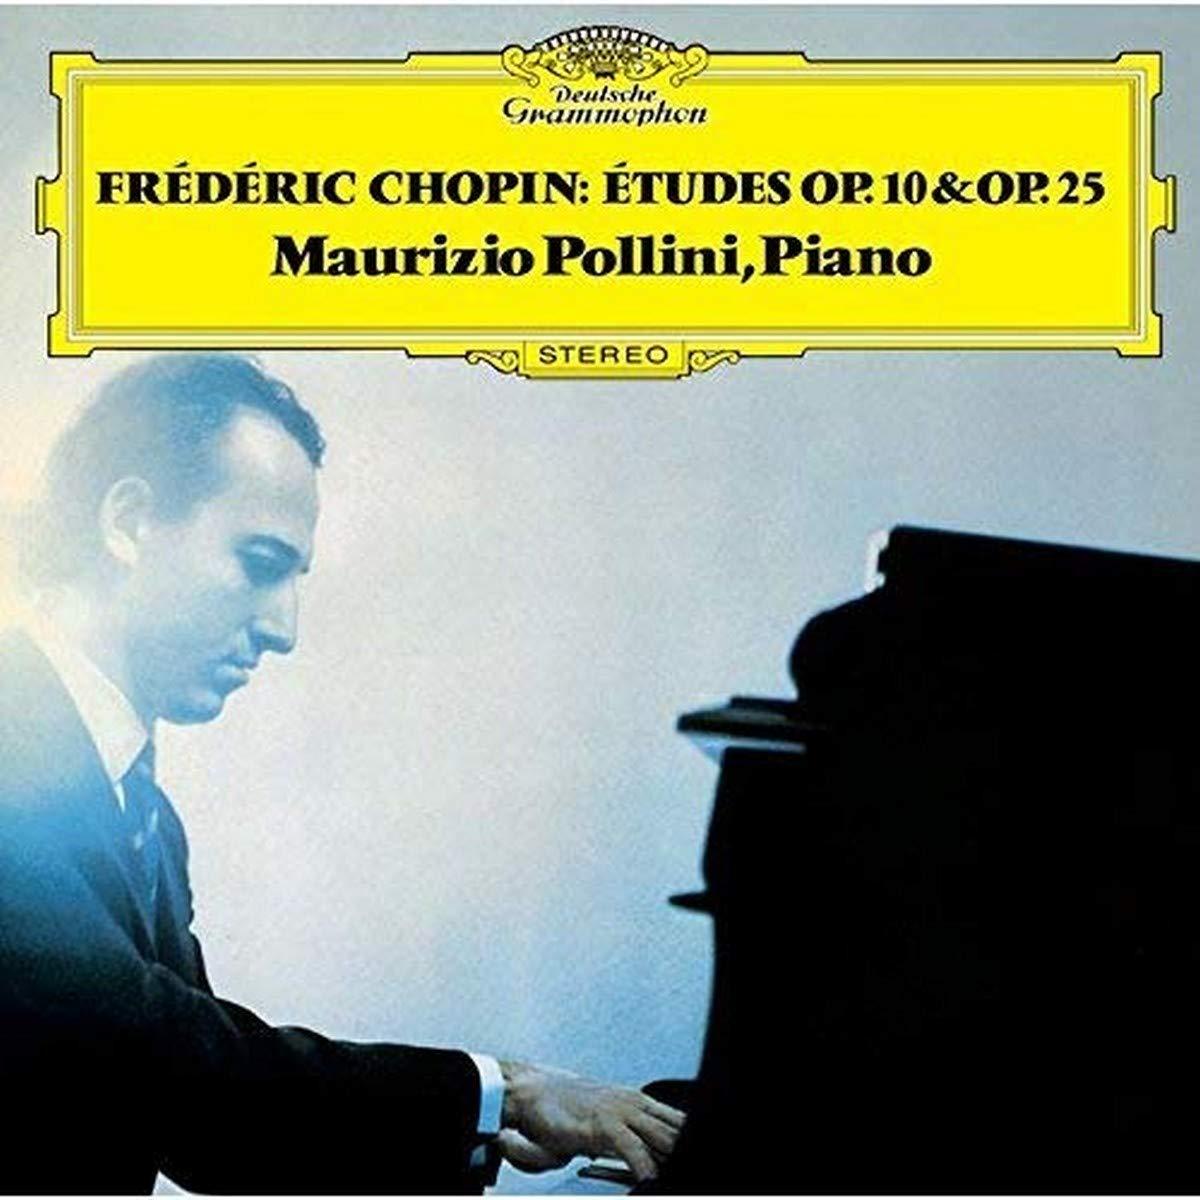 Genuine Chopin: Etudes High quality new